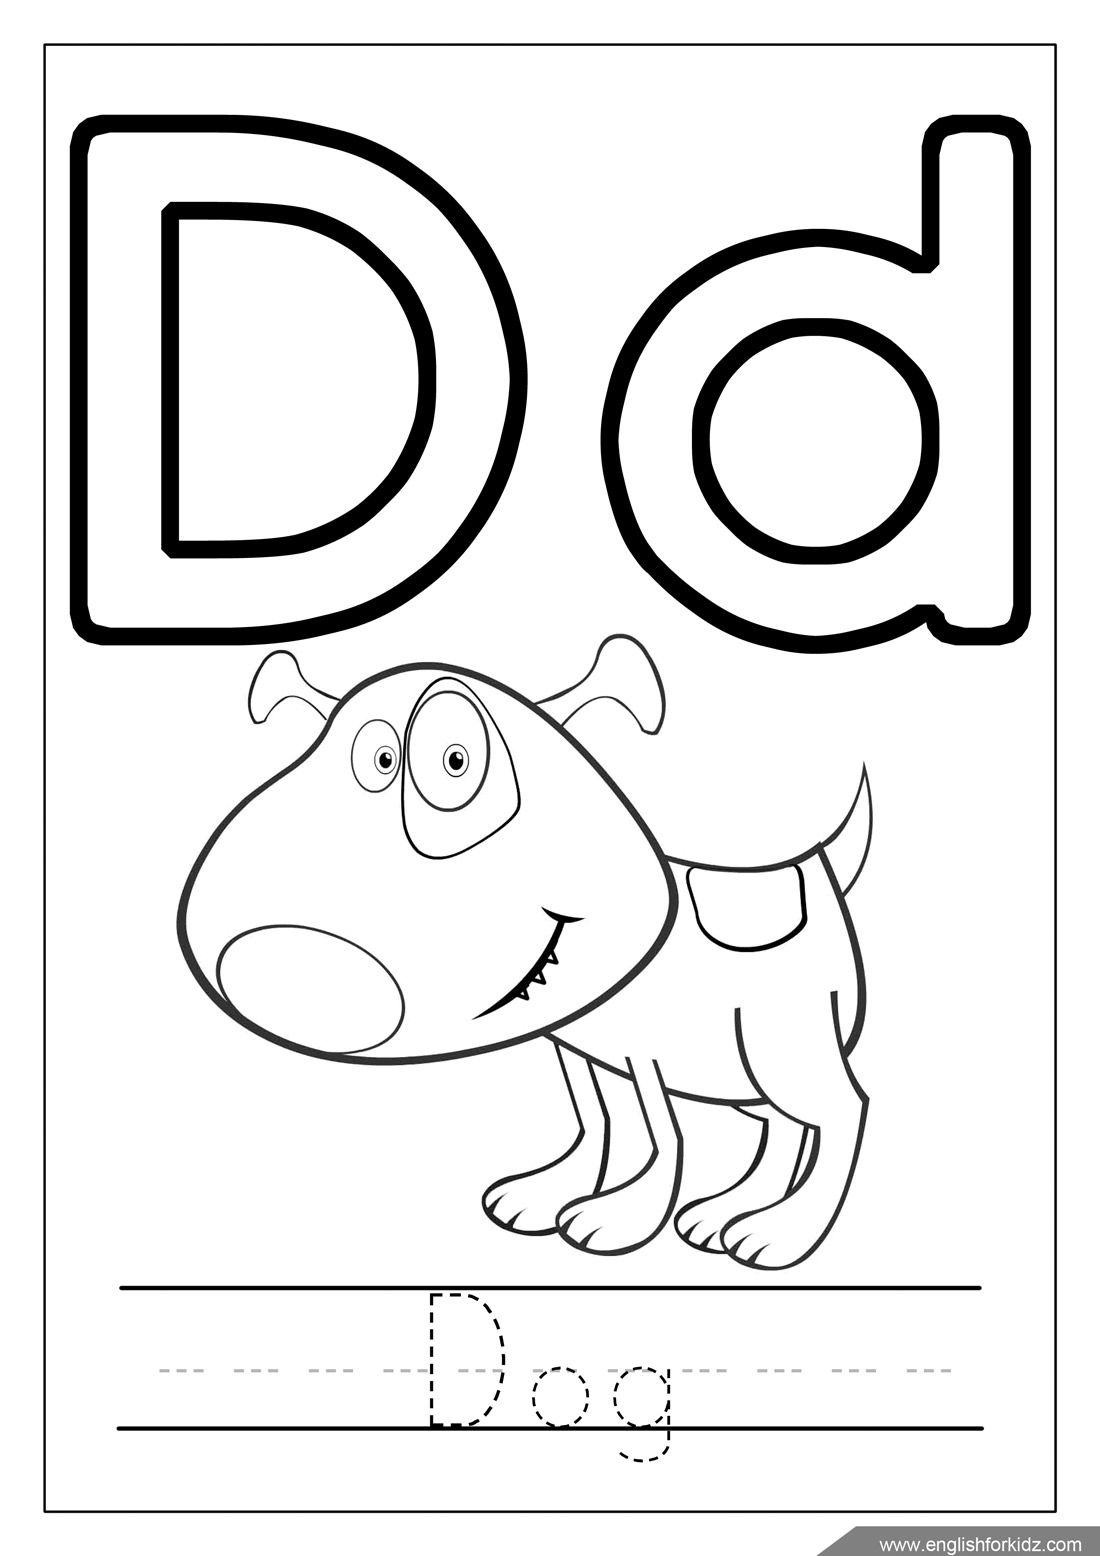 Alphabet coloring page, letter d coloring, d is for dog  Alphabet